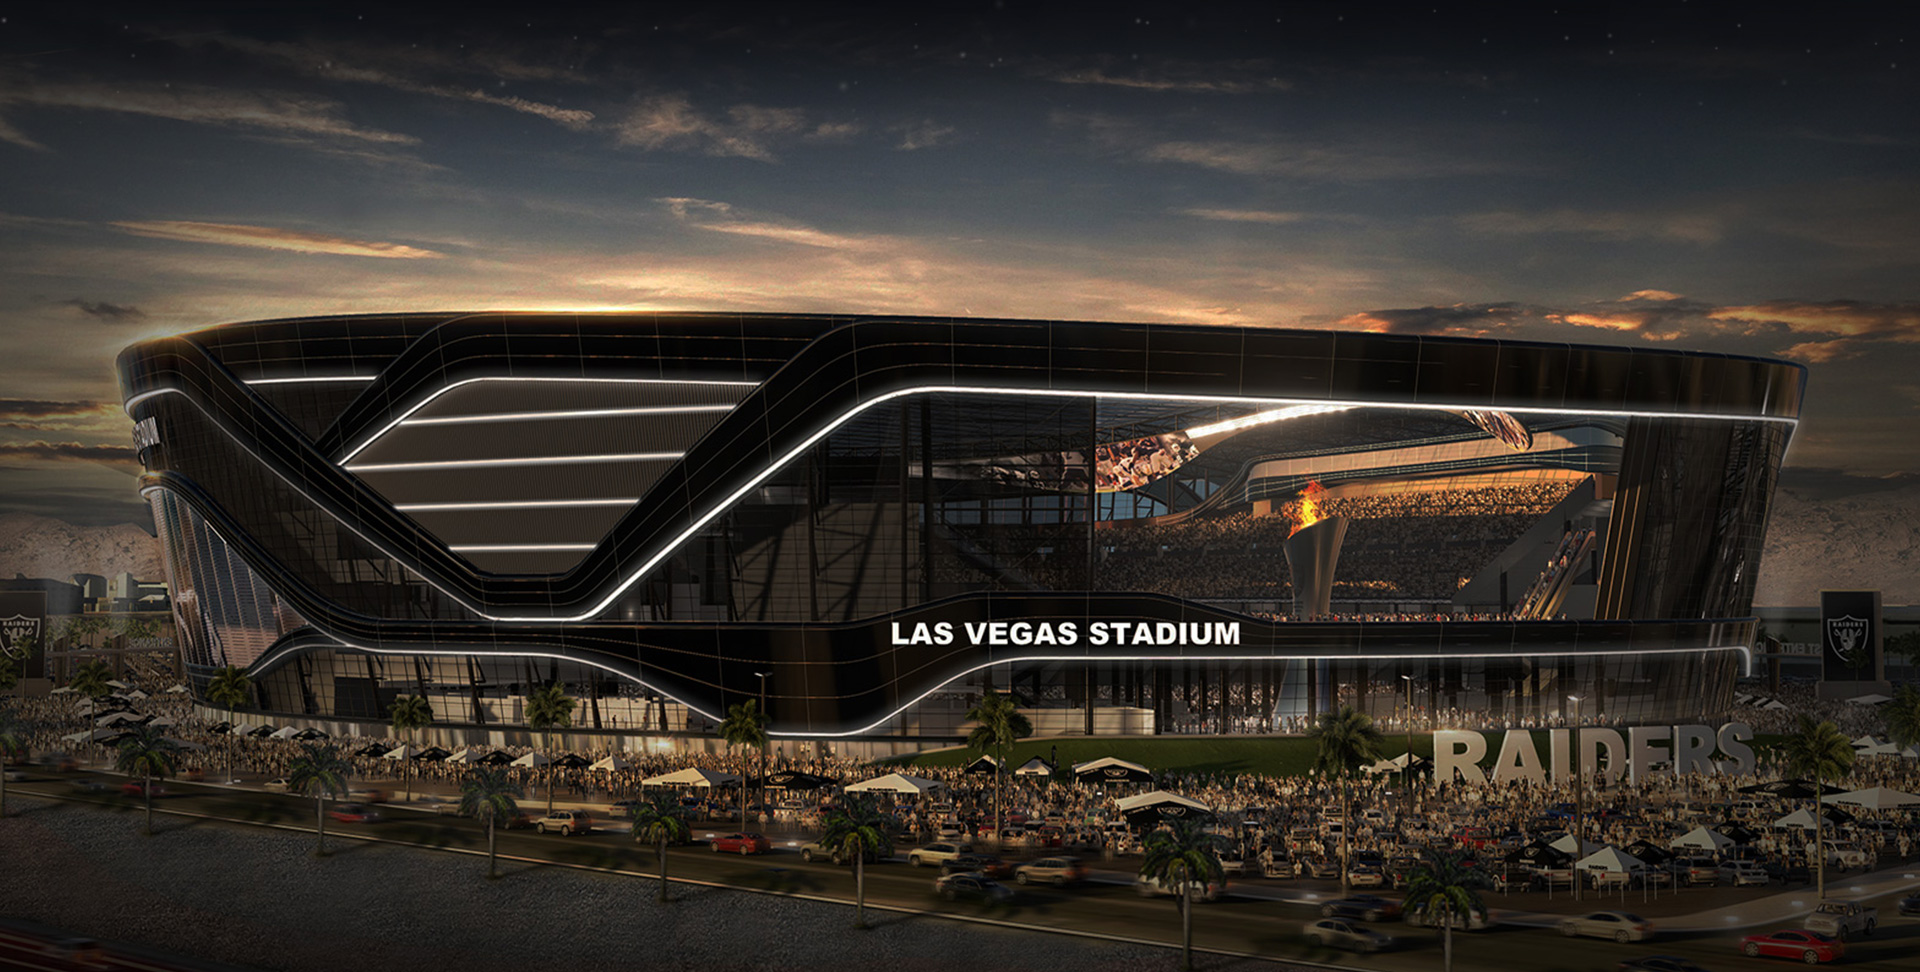 Las Vegas Nfl